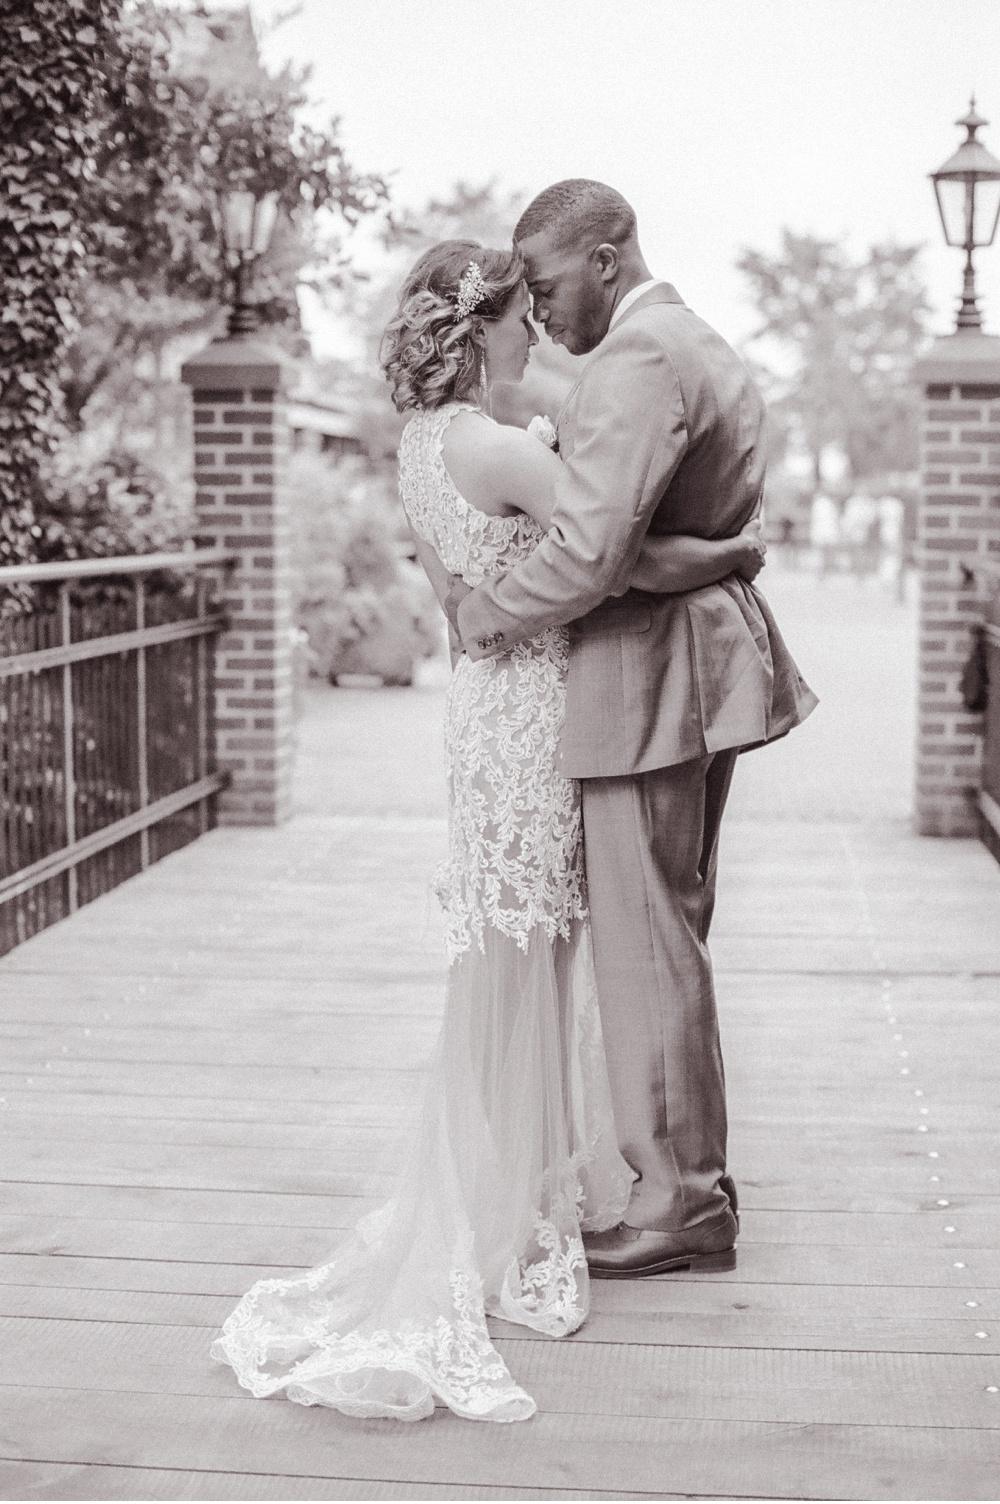 FineArt_Wedding_Photographer@MadalinaSheldon__0018.jpg